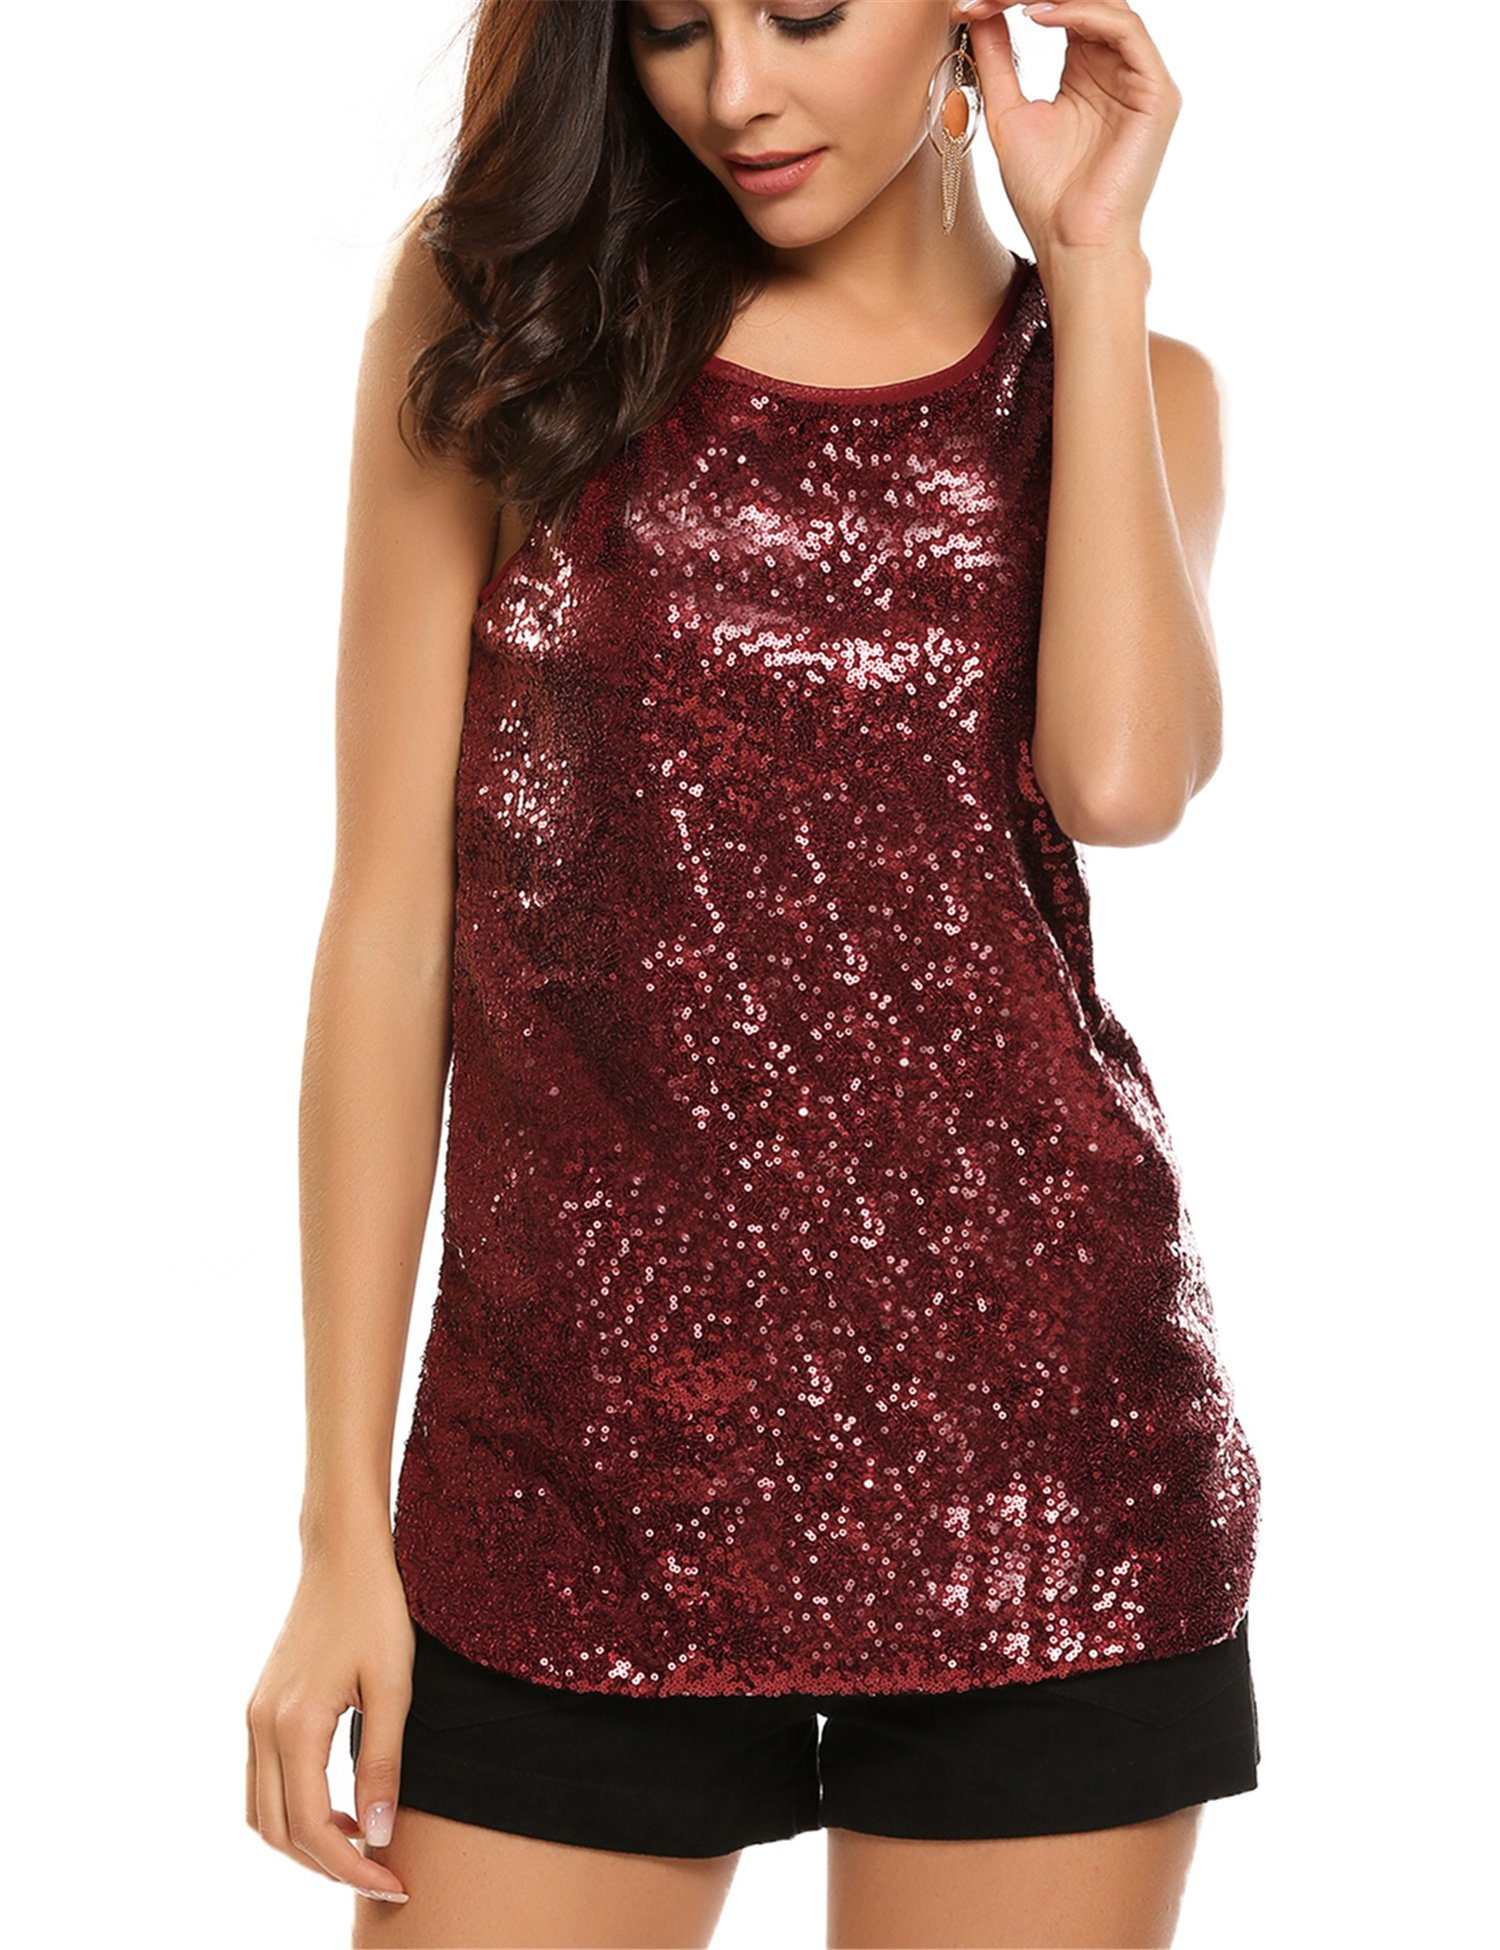 Zeagoo Women's Sleeveless Sparkle Shimmer Camisole Loose Sequined Vest Tank Tops, 1-dark Red, Medium